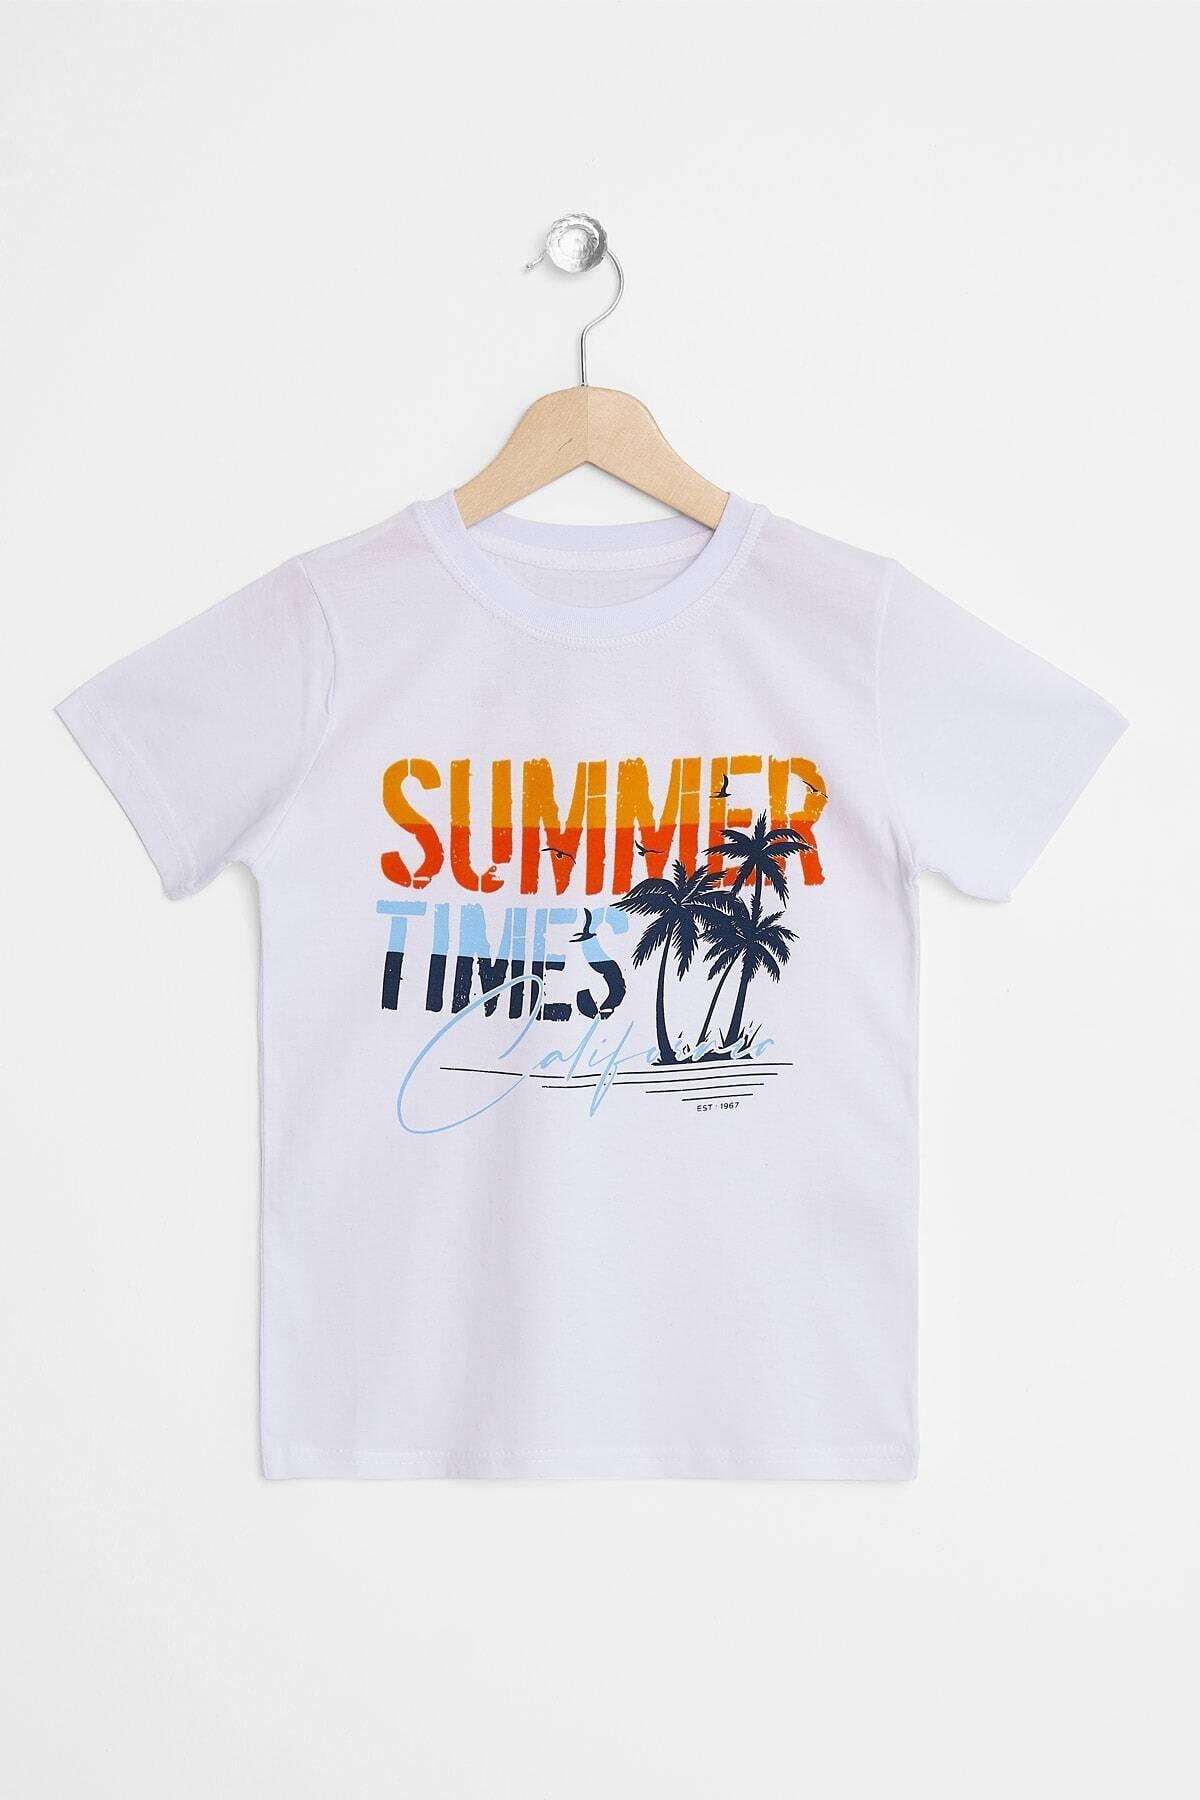 Erkek Çocuk T-shirt Summer Times Baskılı 3-12 Yaş